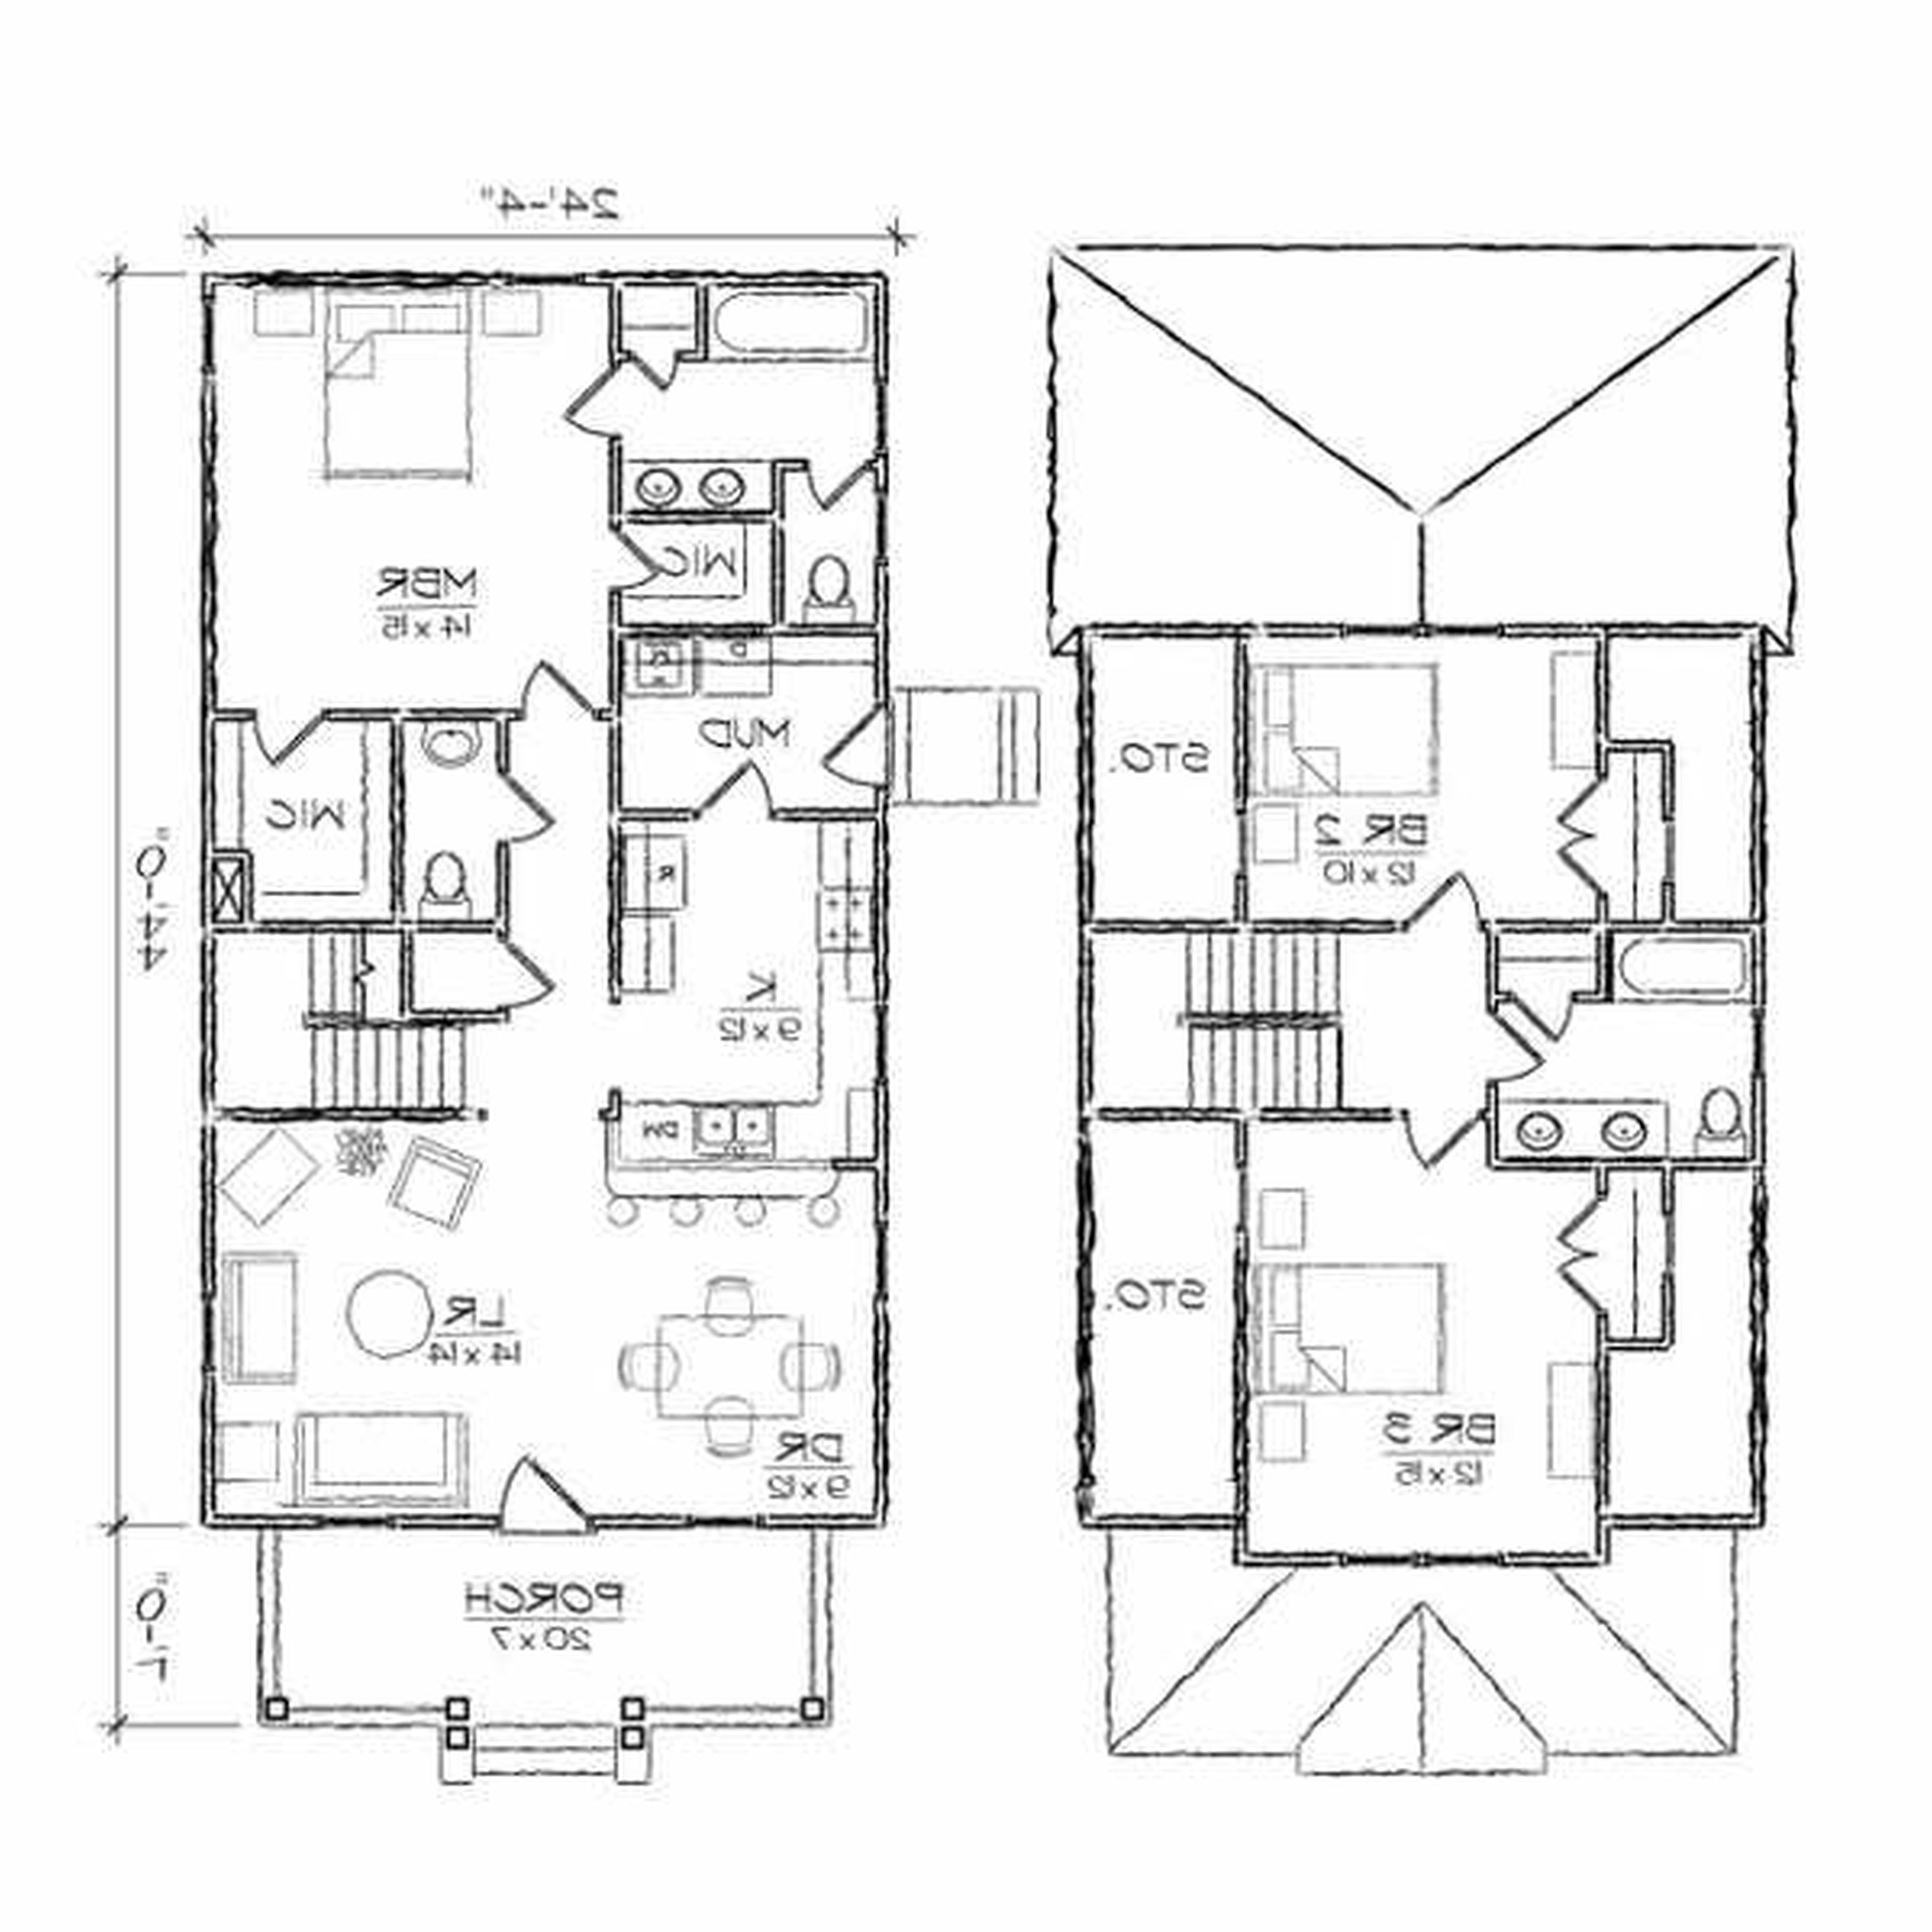 Architecture Impressive Architecture Minimalist House Plans With Amusing Bedroom Designer Online Free 2018